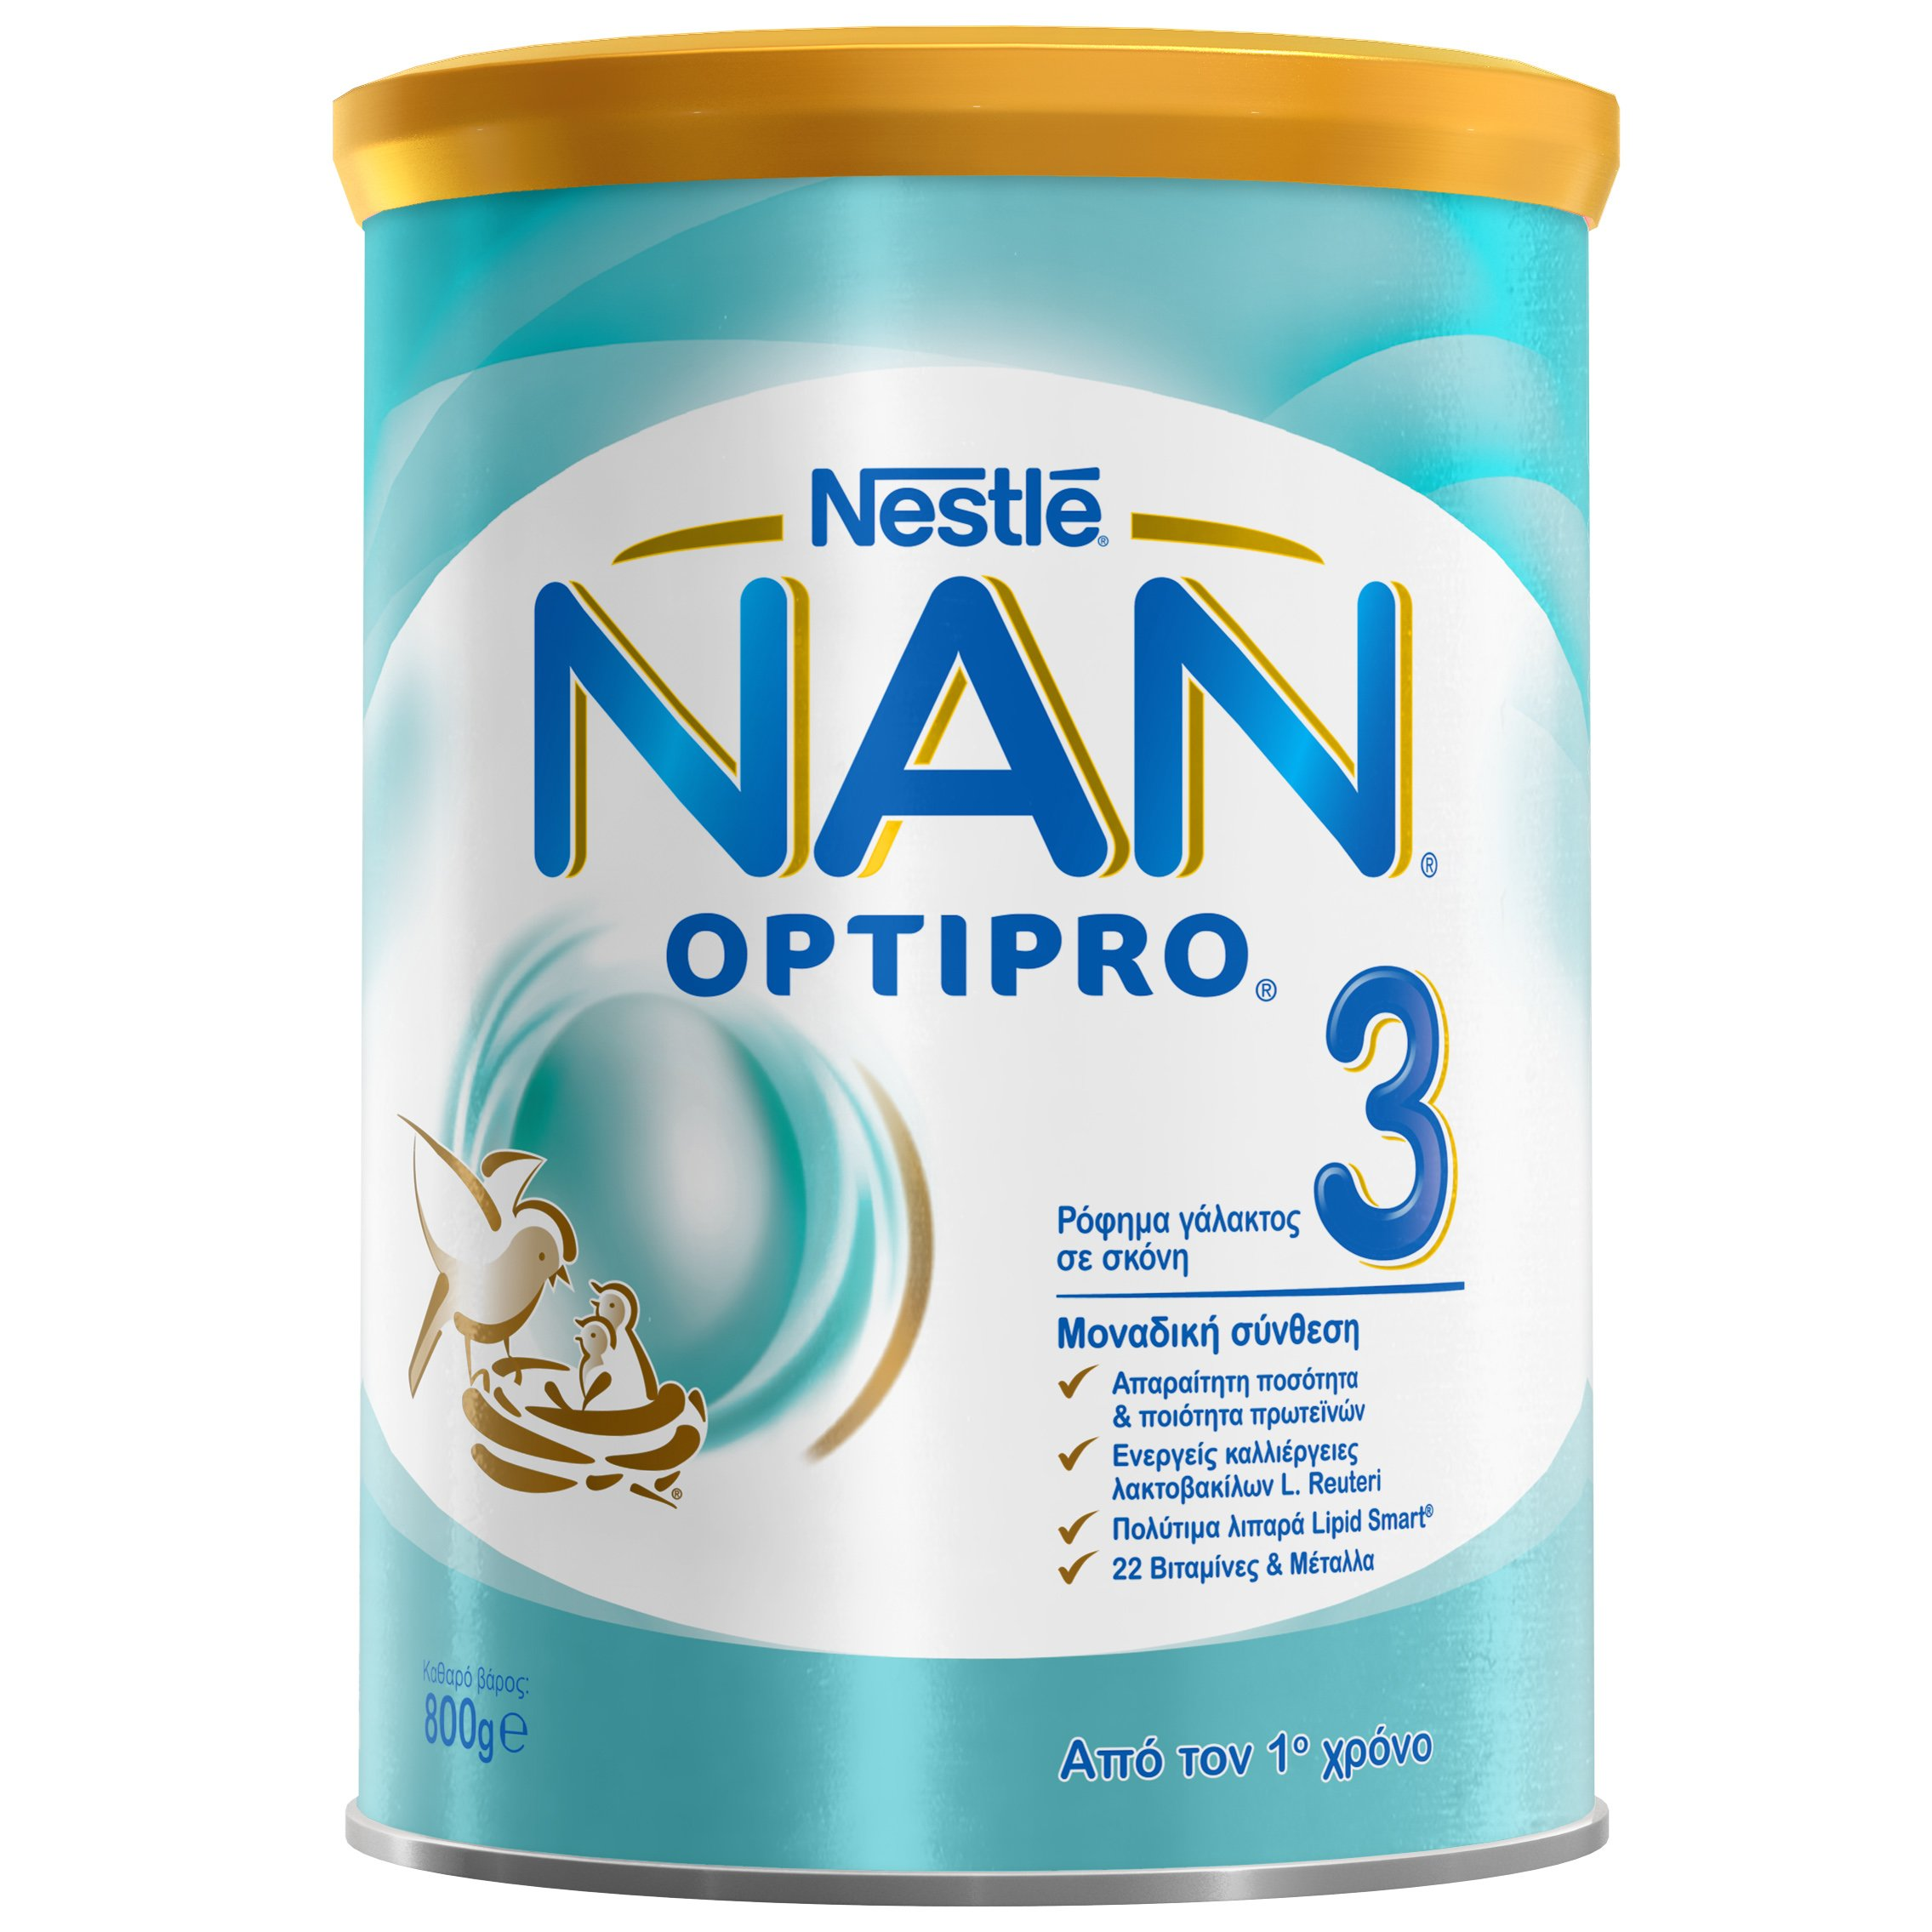 Nestle NAN Optipro 3 Ρόφημα Γάλακτος σε Σκόνη, Κατάλληλο Από τον 1ο Χρόνο 800gr